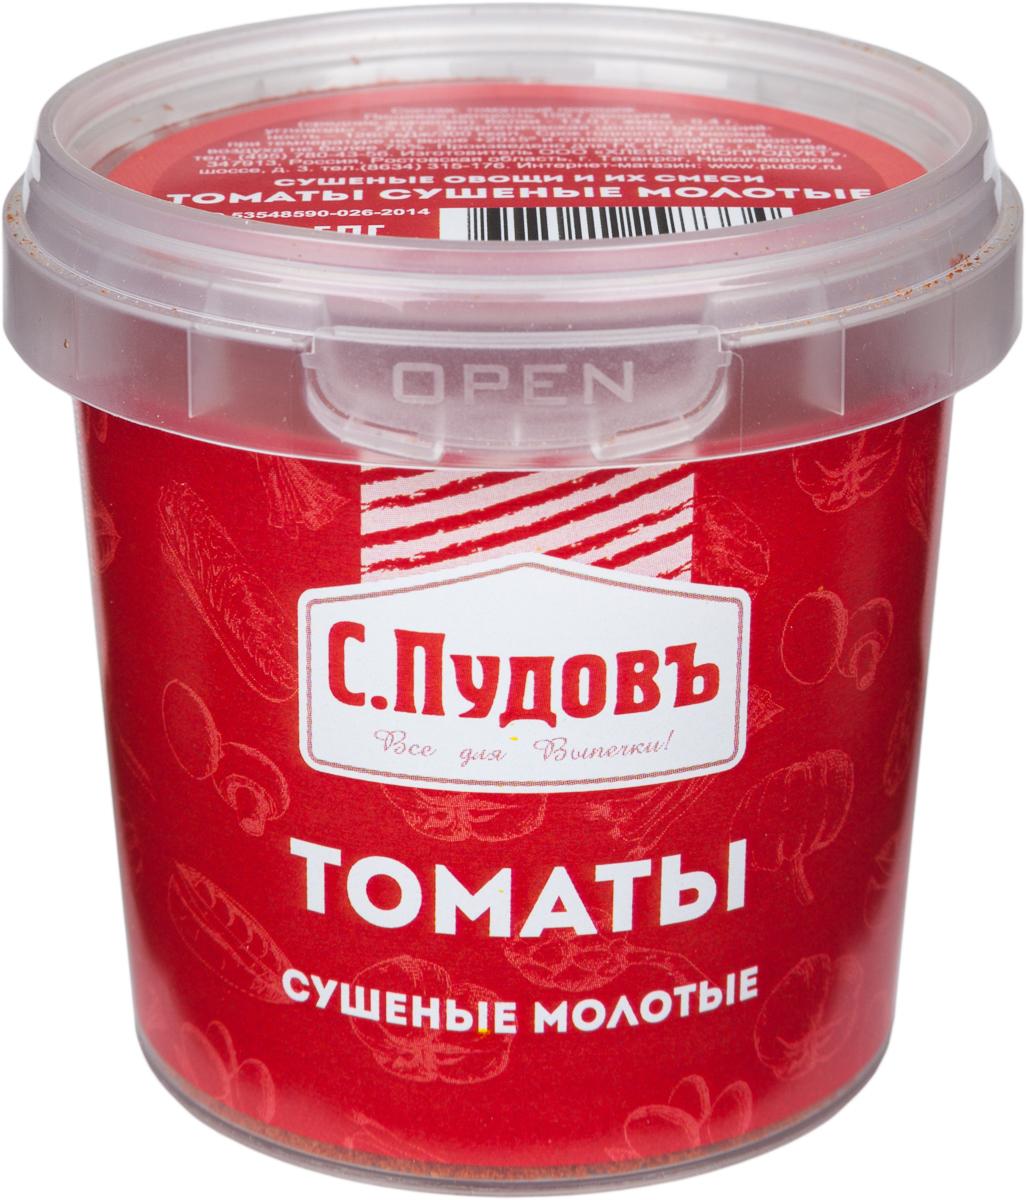 С. Пудовъ Пудовъ томаты сушеные молотые, 85 г 4607012297334